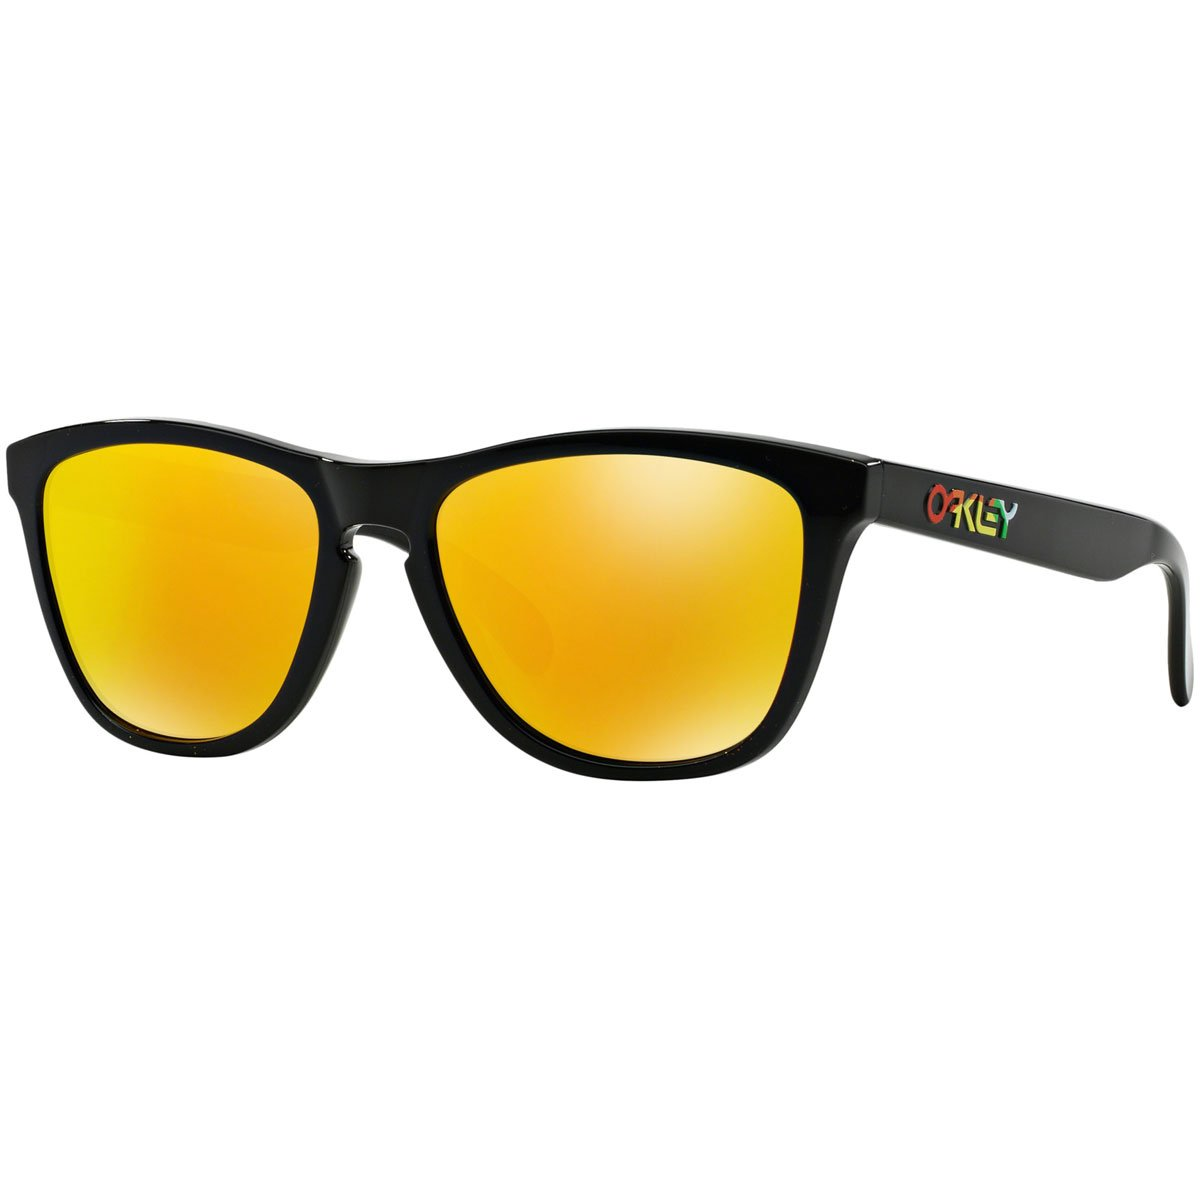 Oakley Men's Frogskins VR/46 Sunglasses,Black